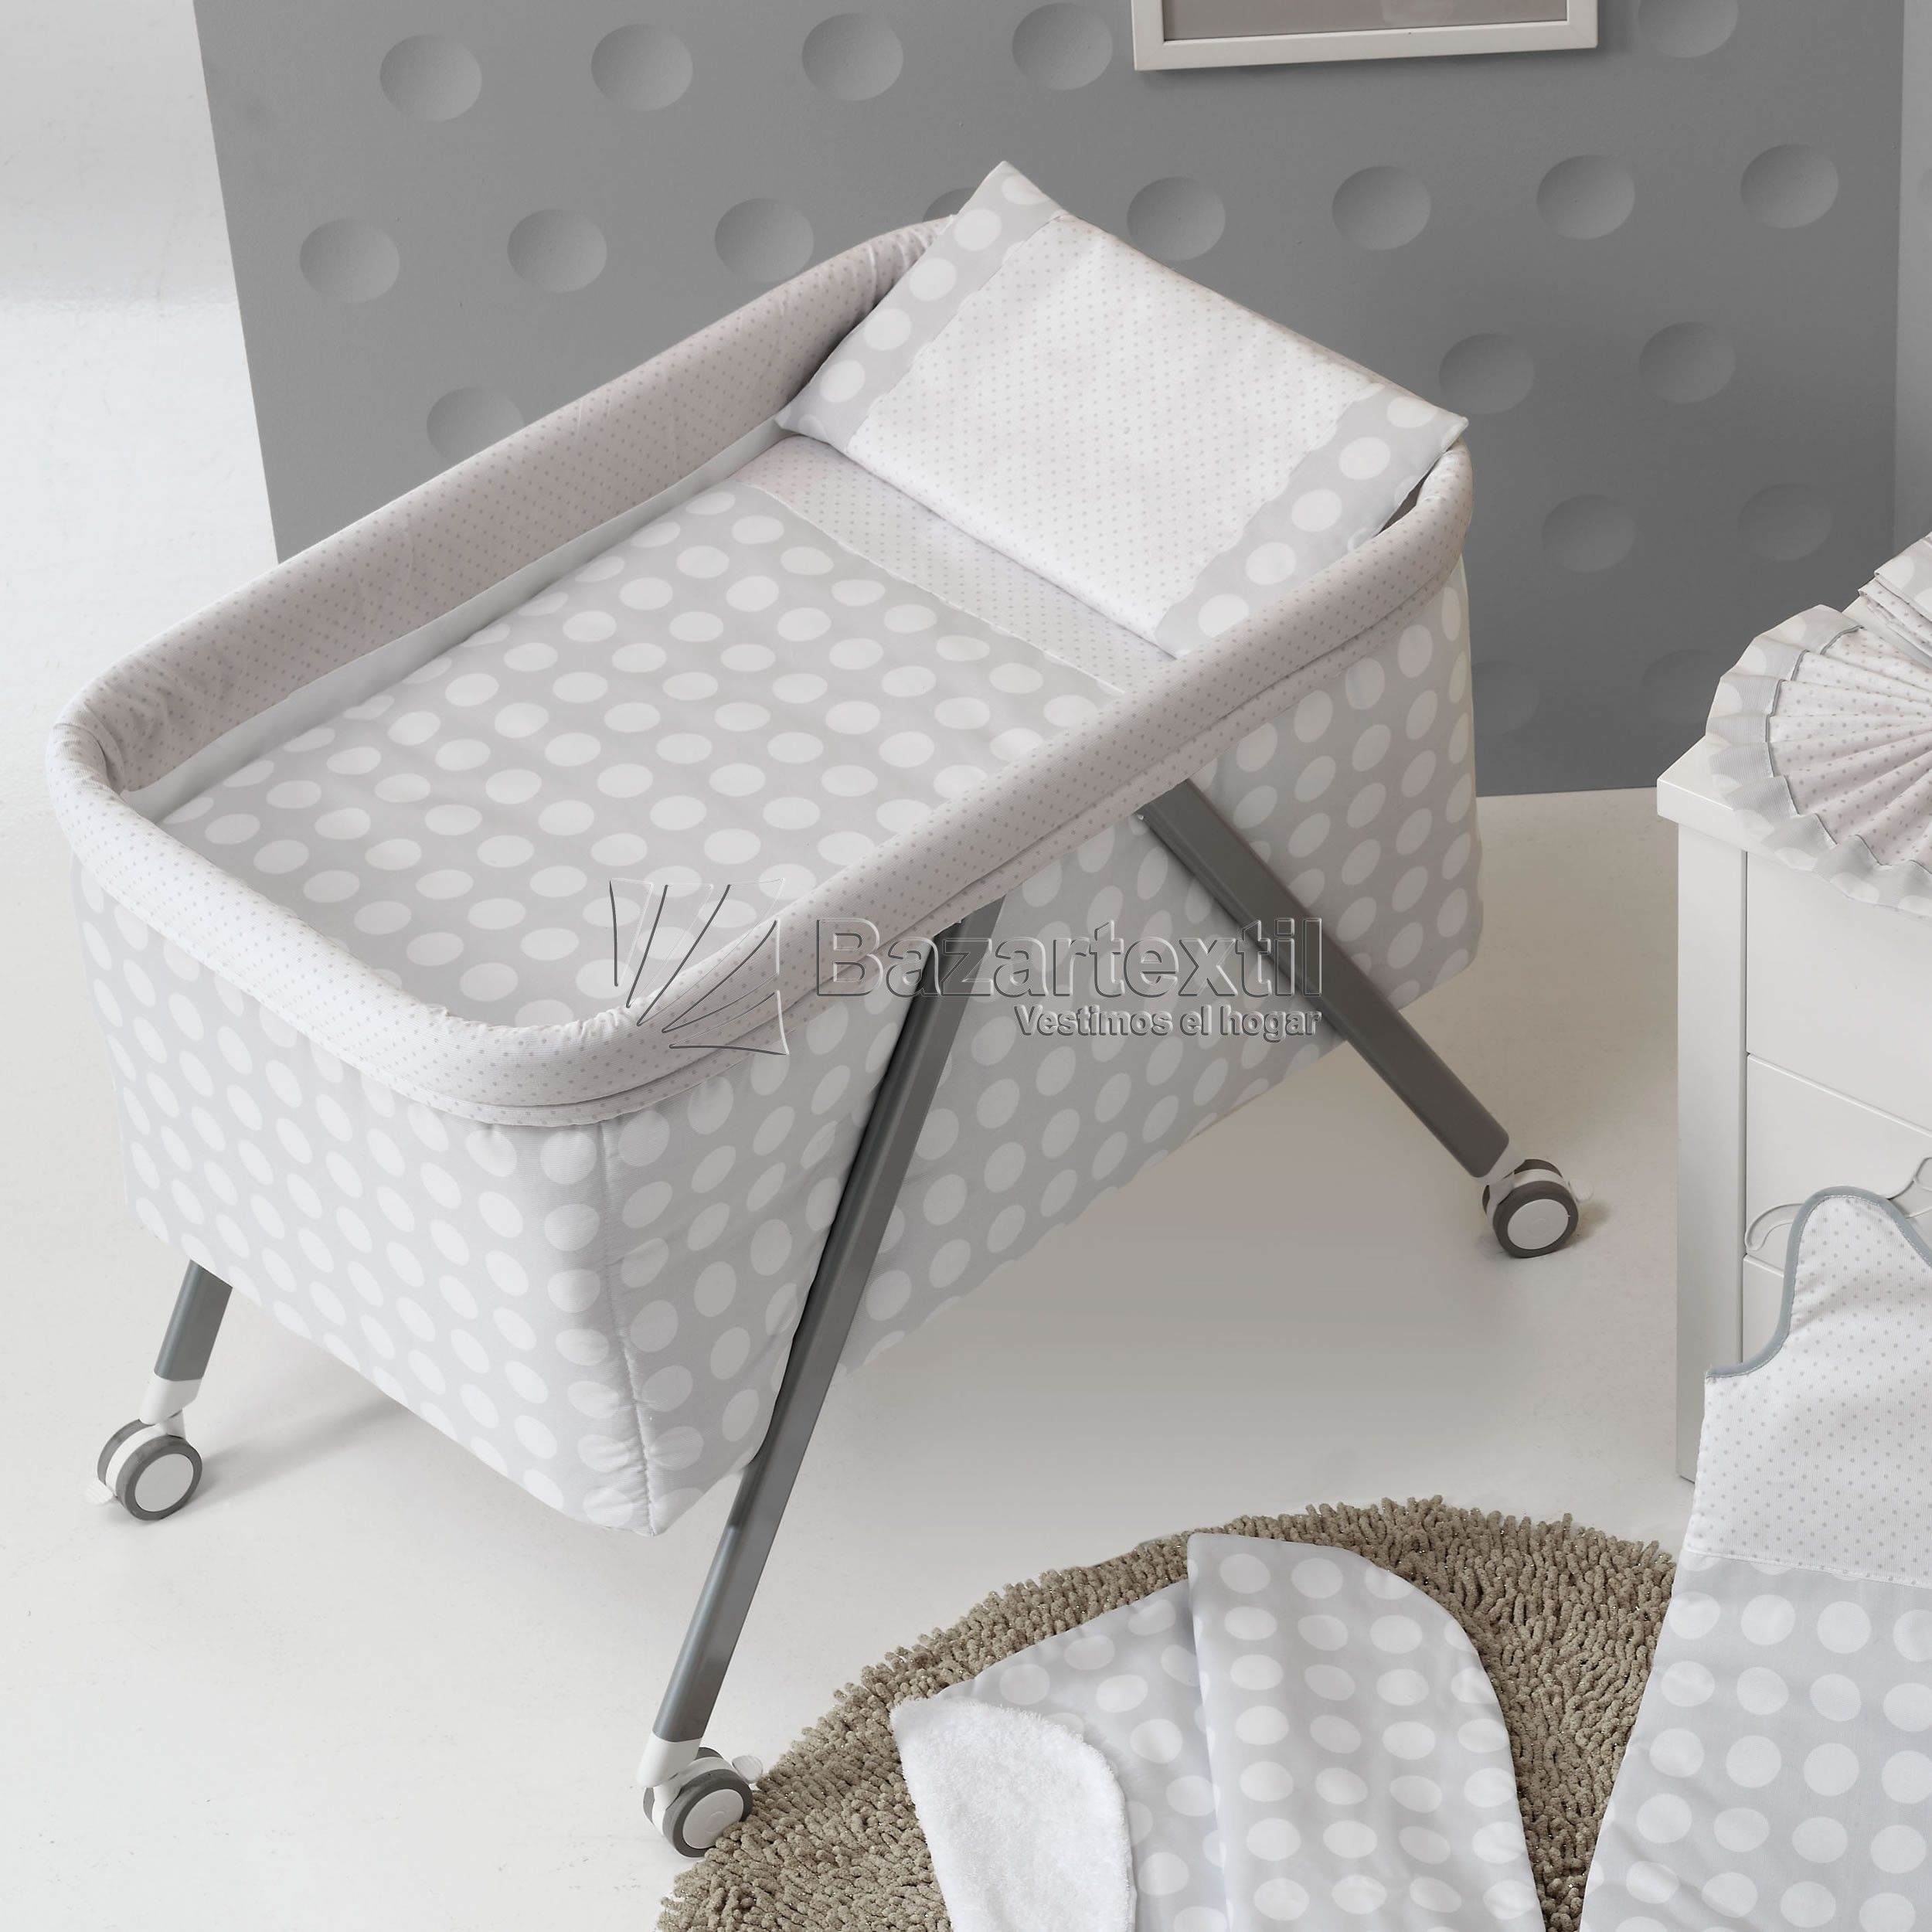 d6fa0ce56 Minicuna Aluminio Lunares Gris Interbaby | Habitació bebe | Plastic ...